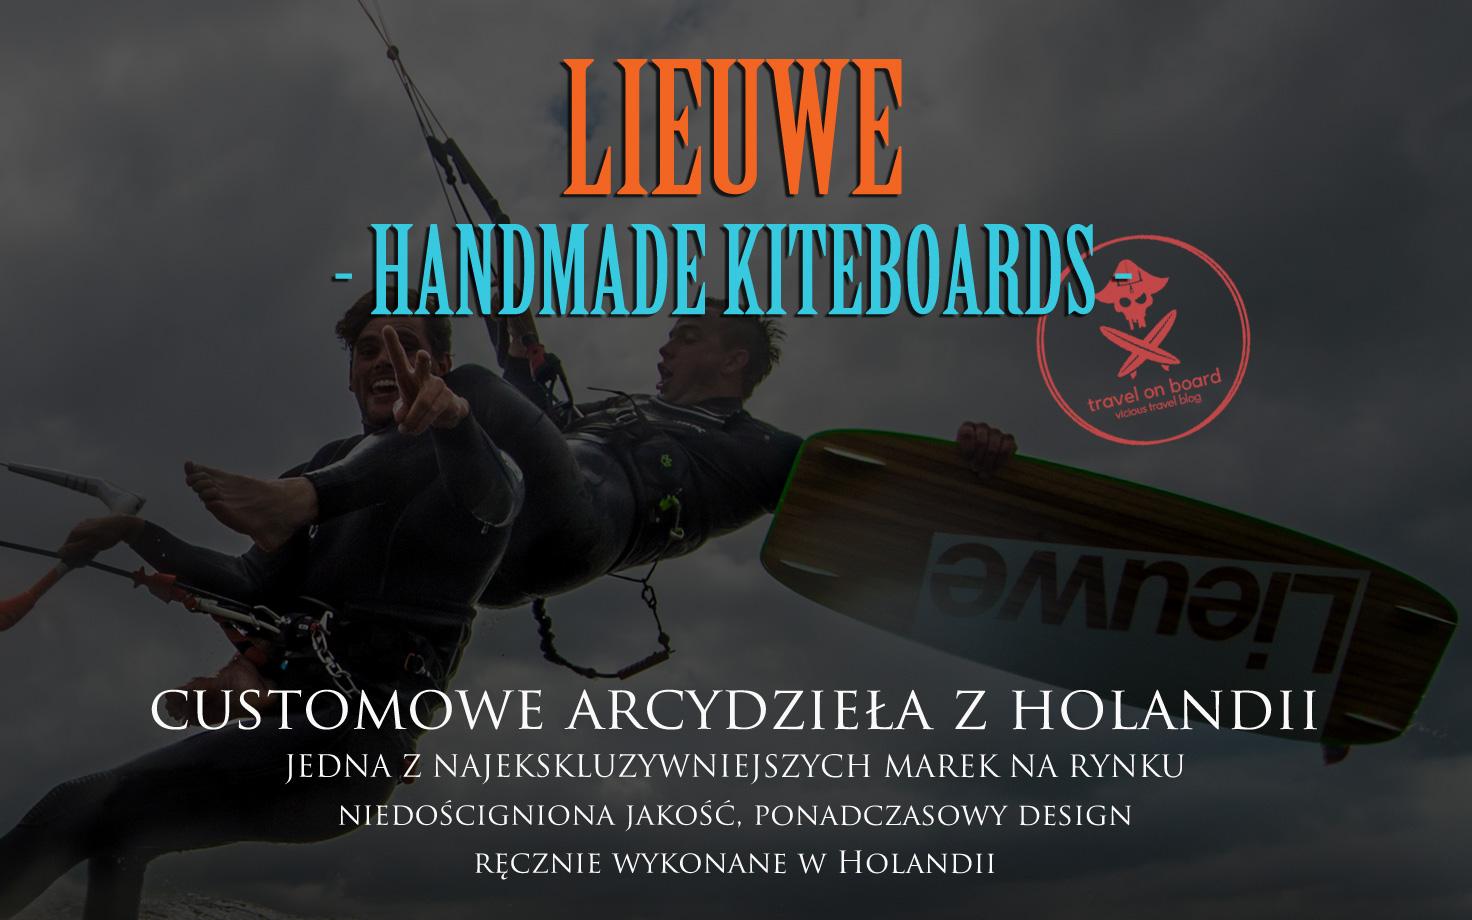 lieuwe handmade custome bords w polsce